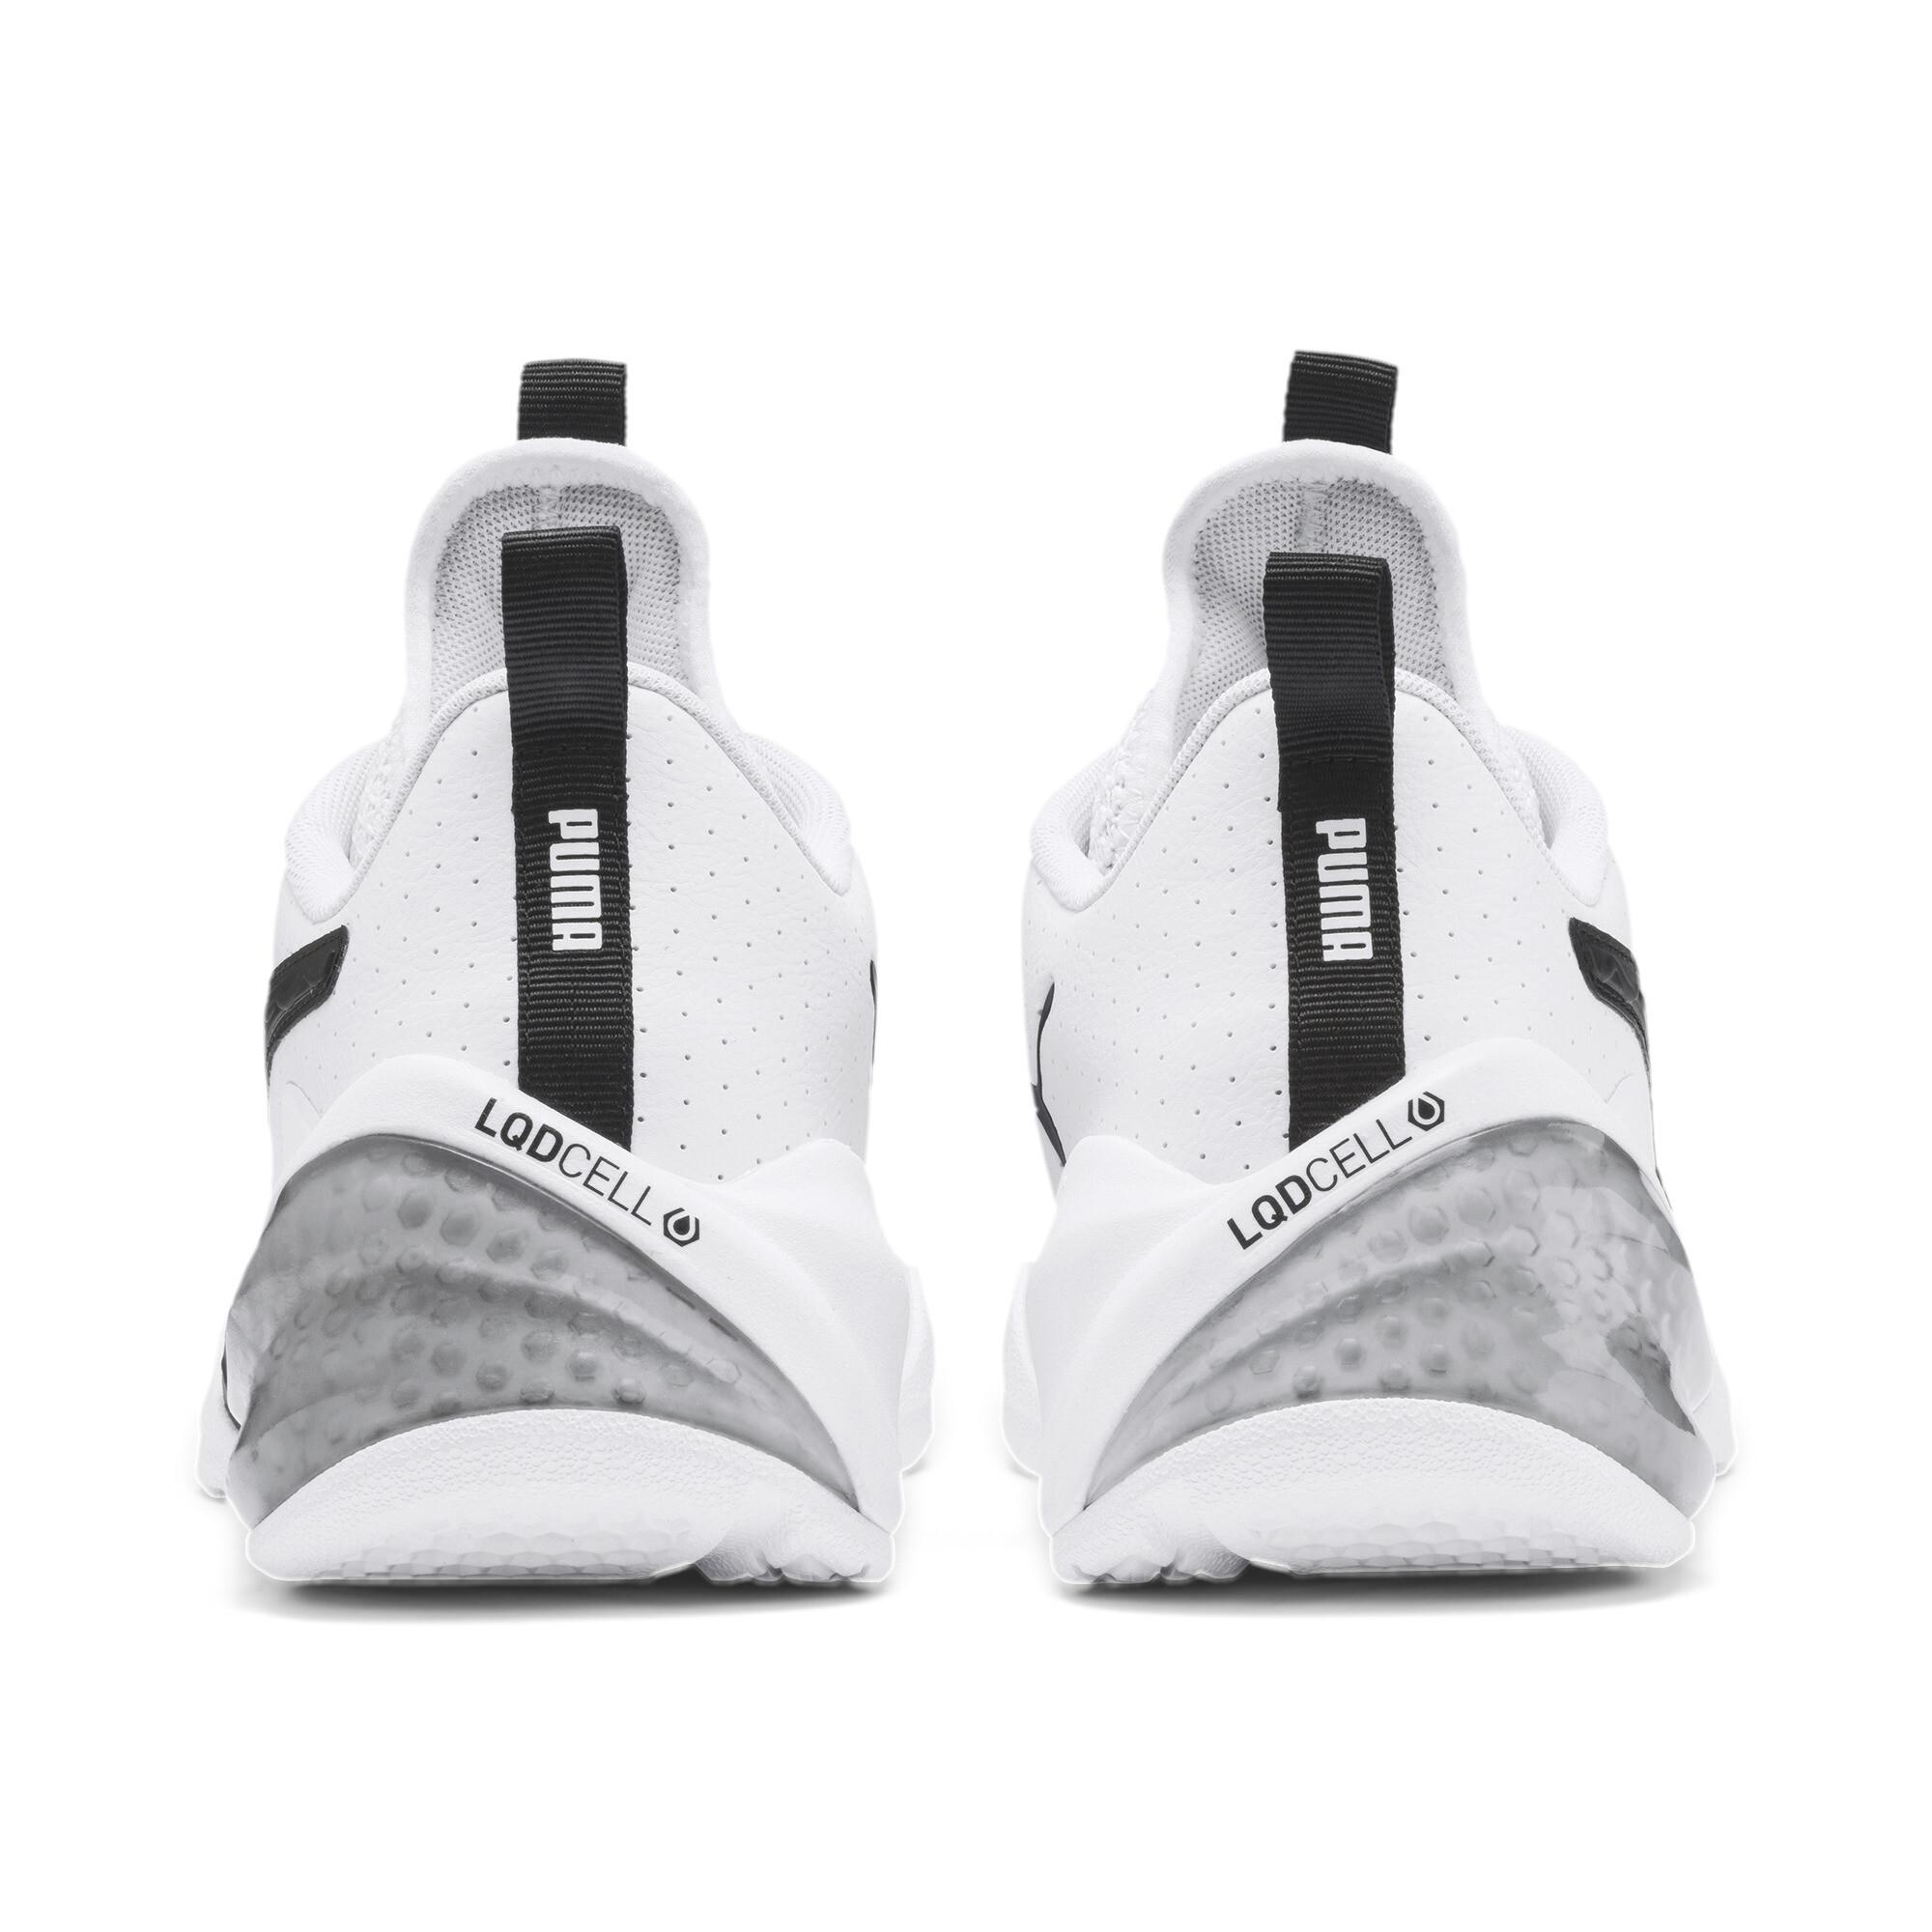 PUMA-Men-039-s-LQDCELL-Challenge-Perf-Training-Shoes thumbnail 3